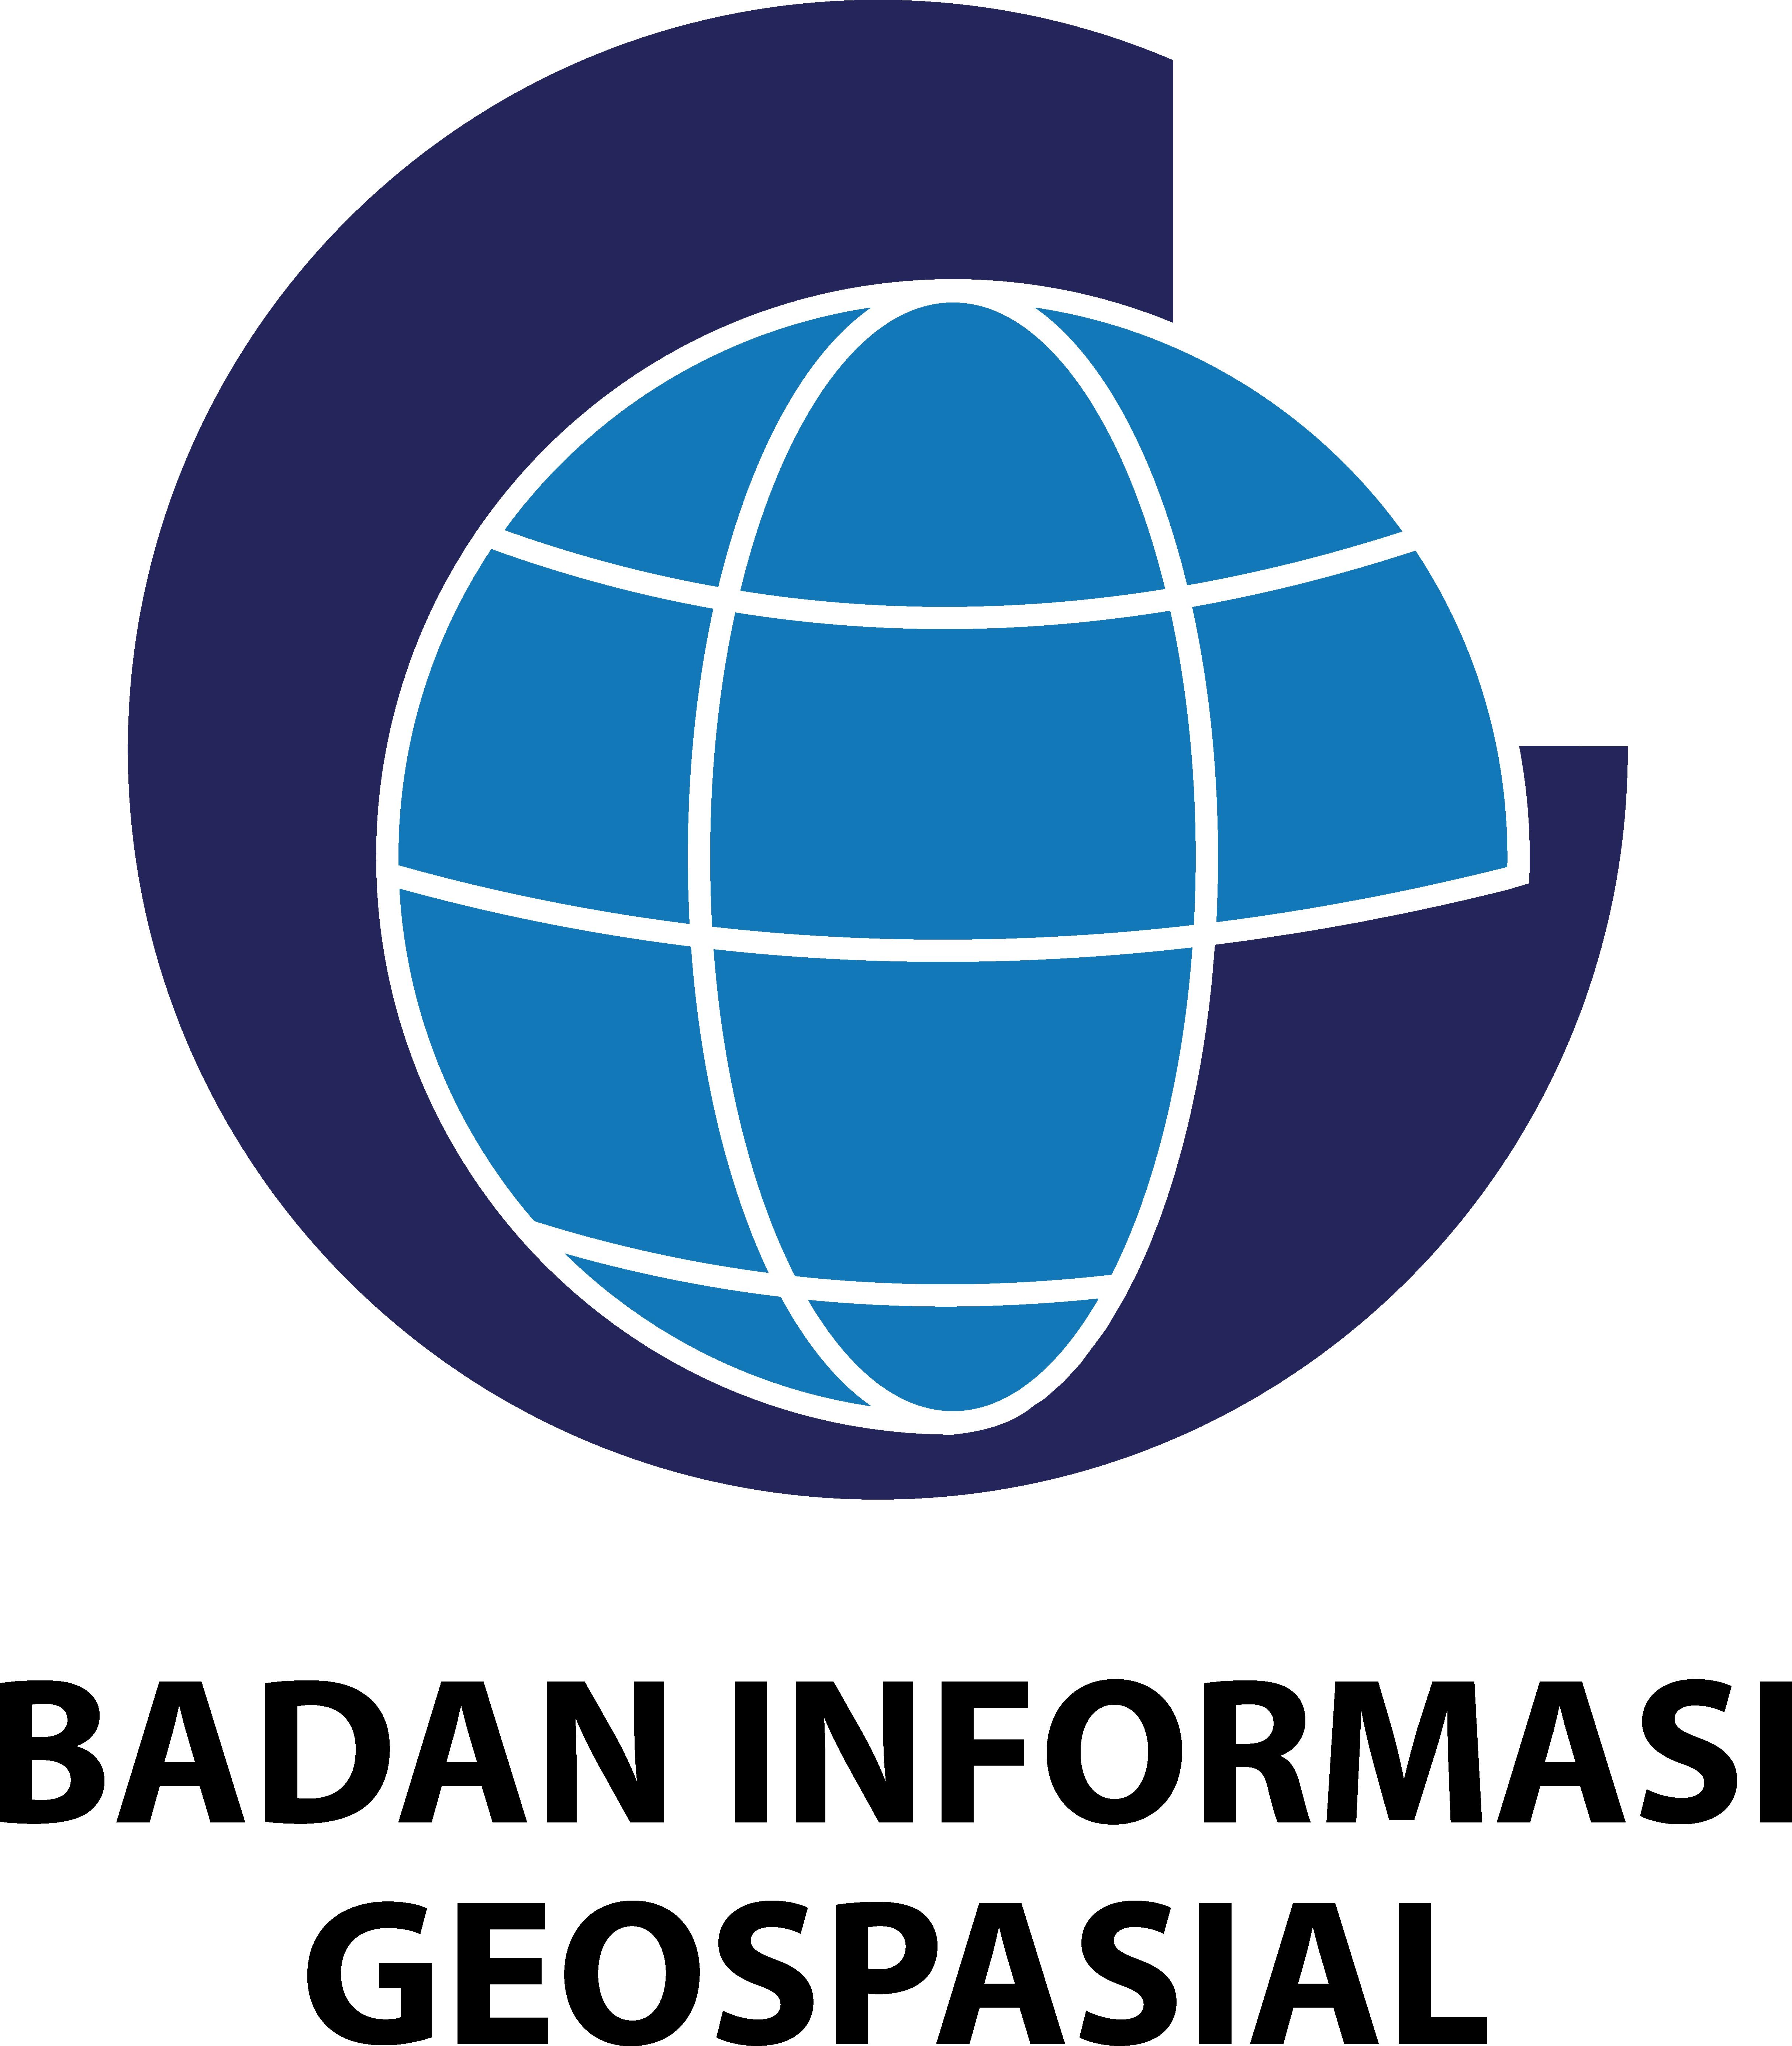 indonesian-geoportal-badan-informasi-geospasial